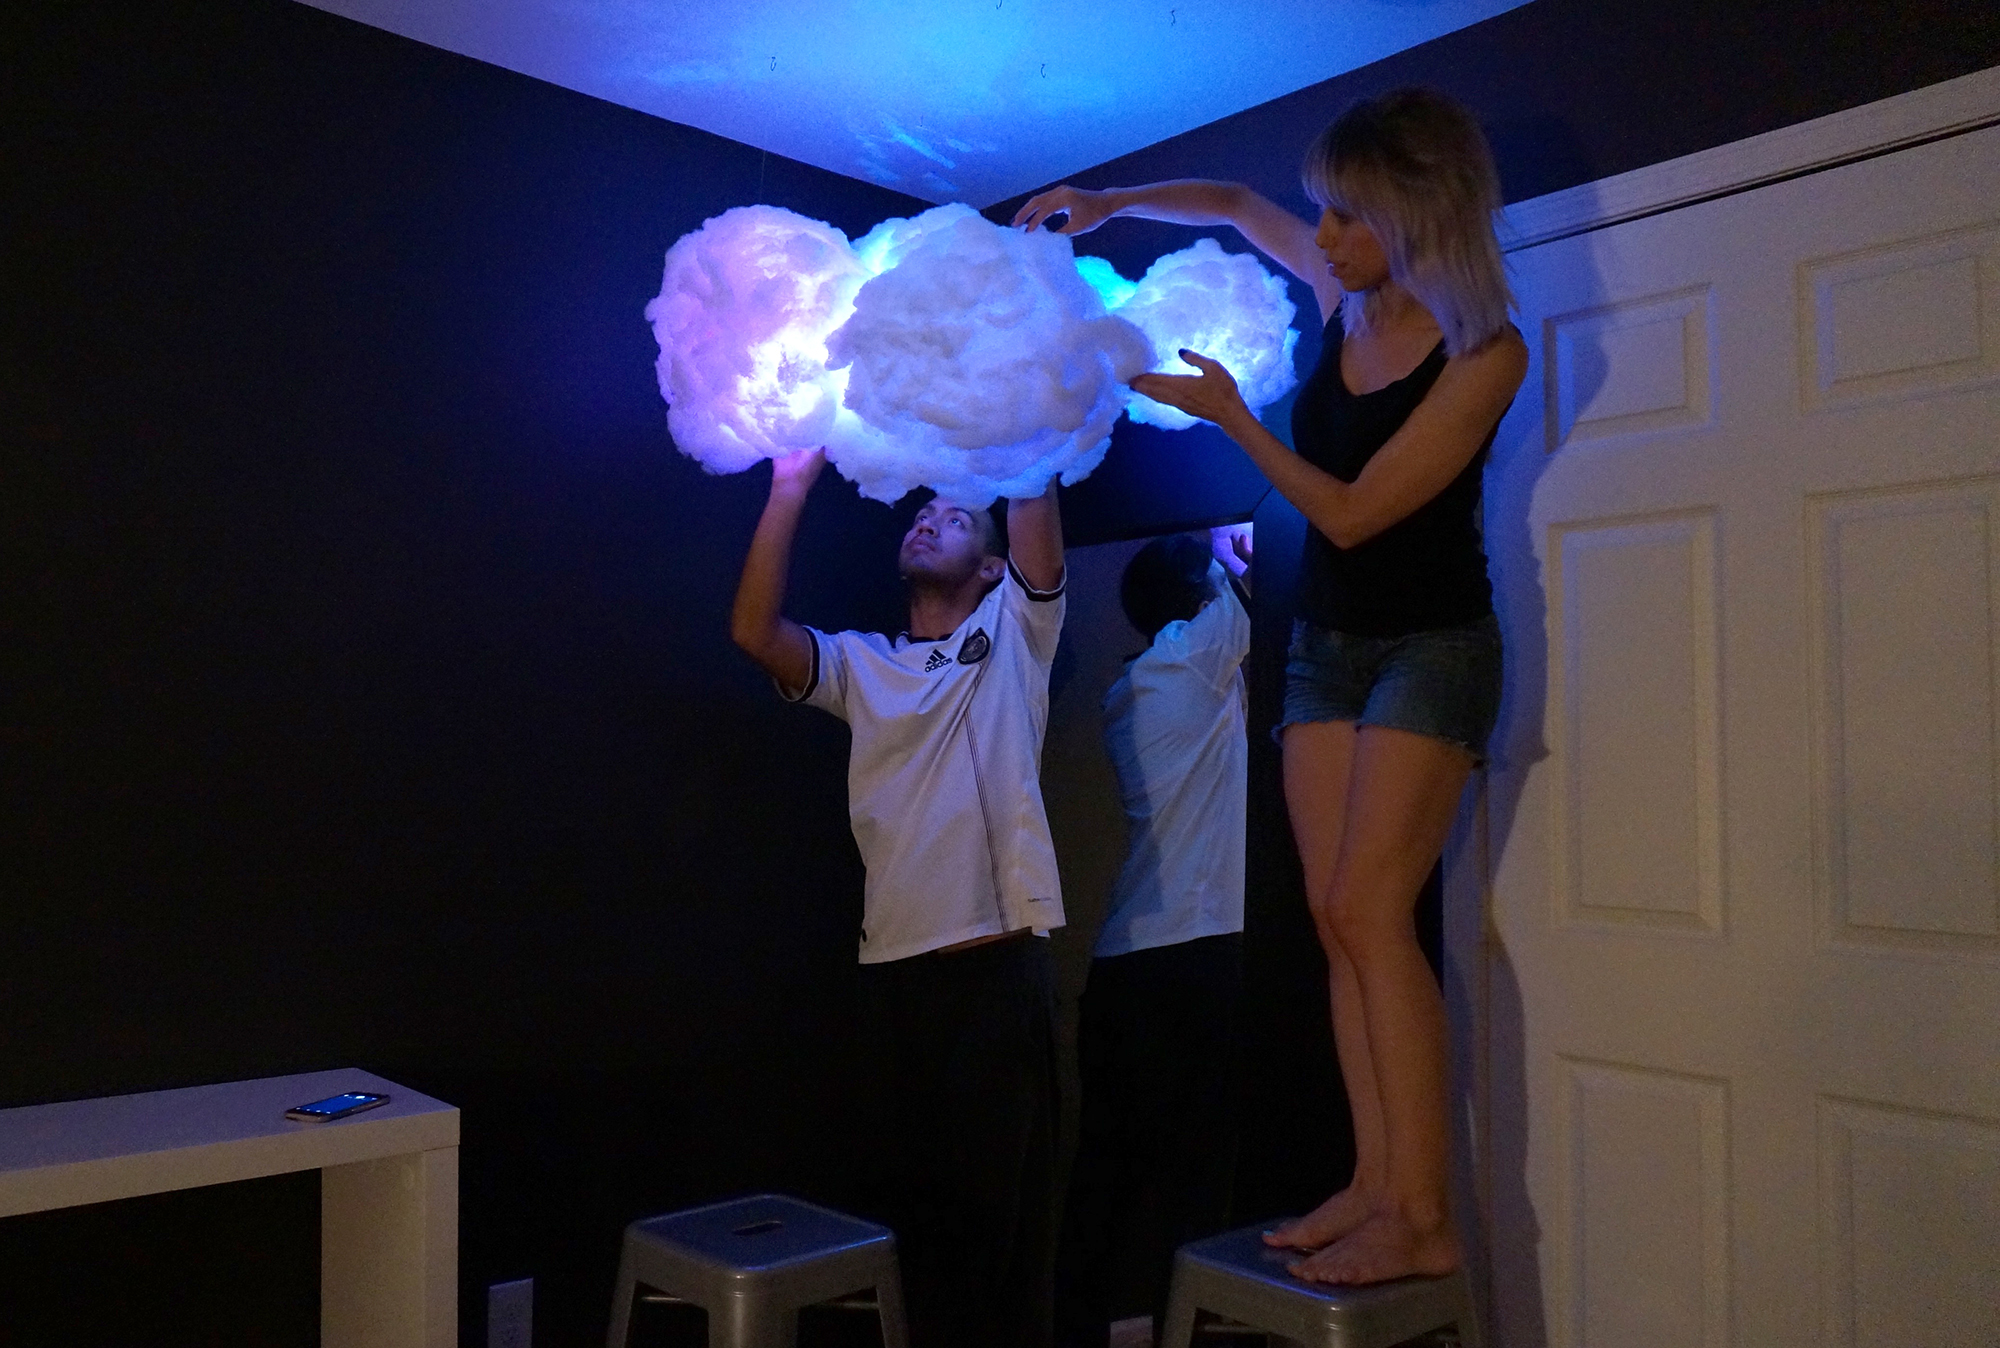 LED lights in cloud lamp